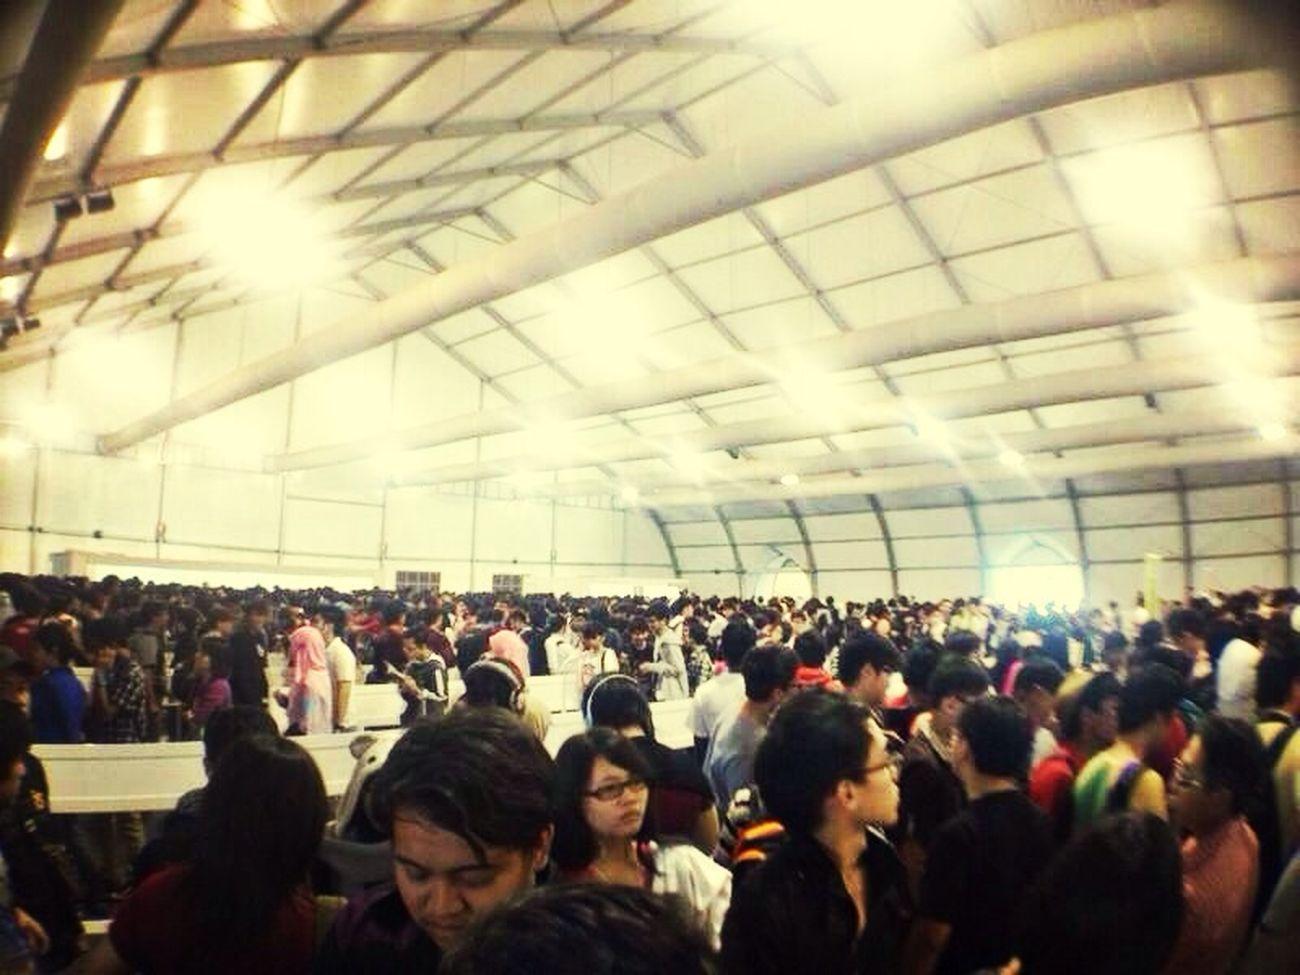 Still at Comic fiesta Login que ... It's Havoc havoc havoc ... Waaaaaaaaaaa Comic ComicFiesta